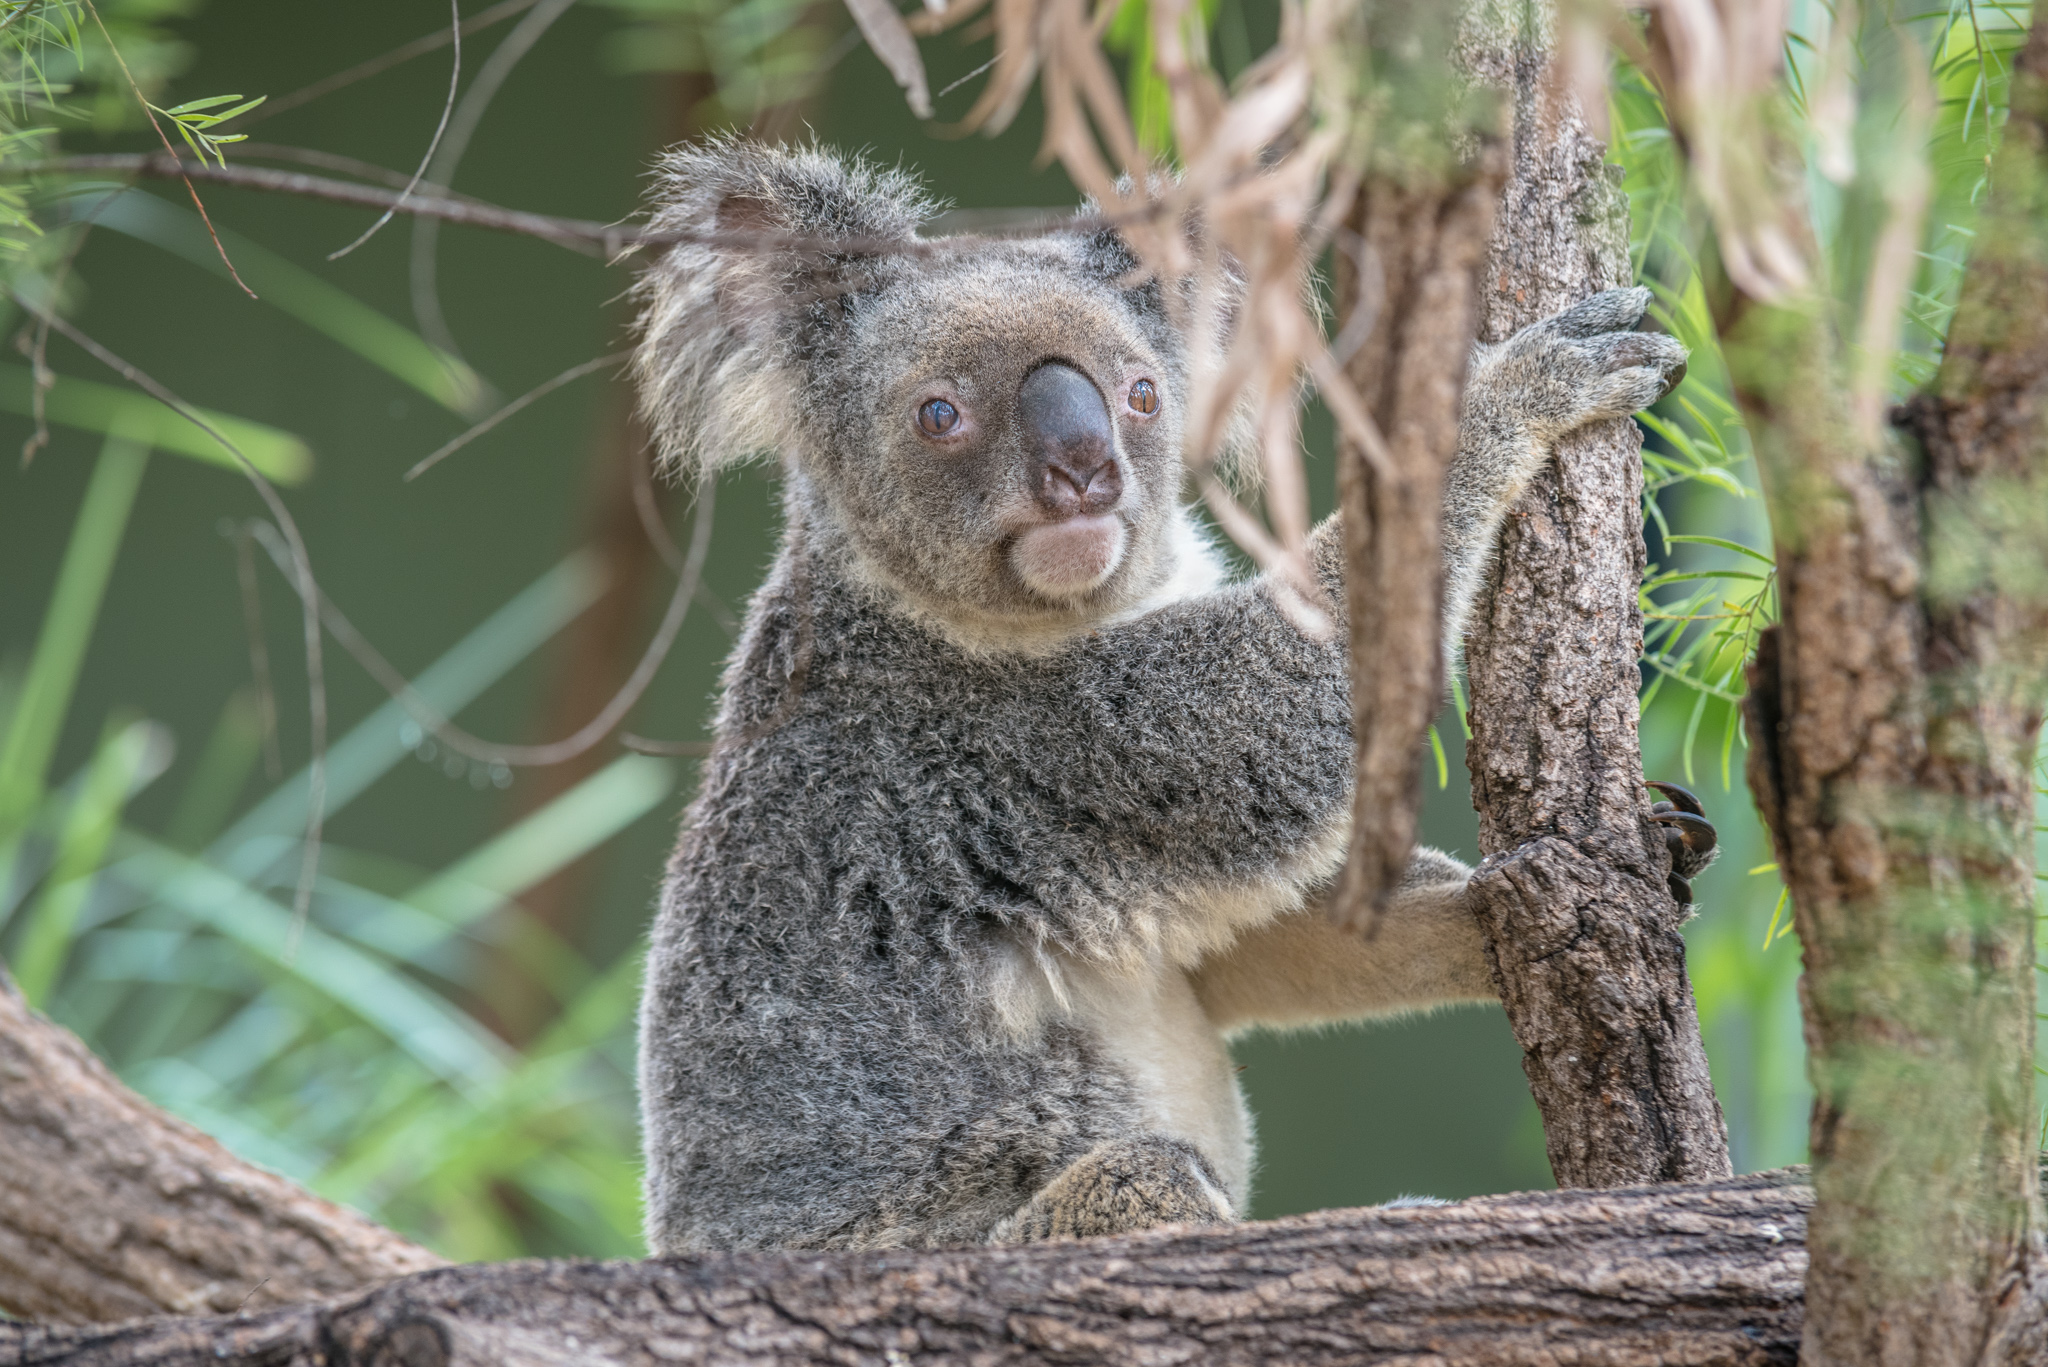 Koalabär im Baum in Australien